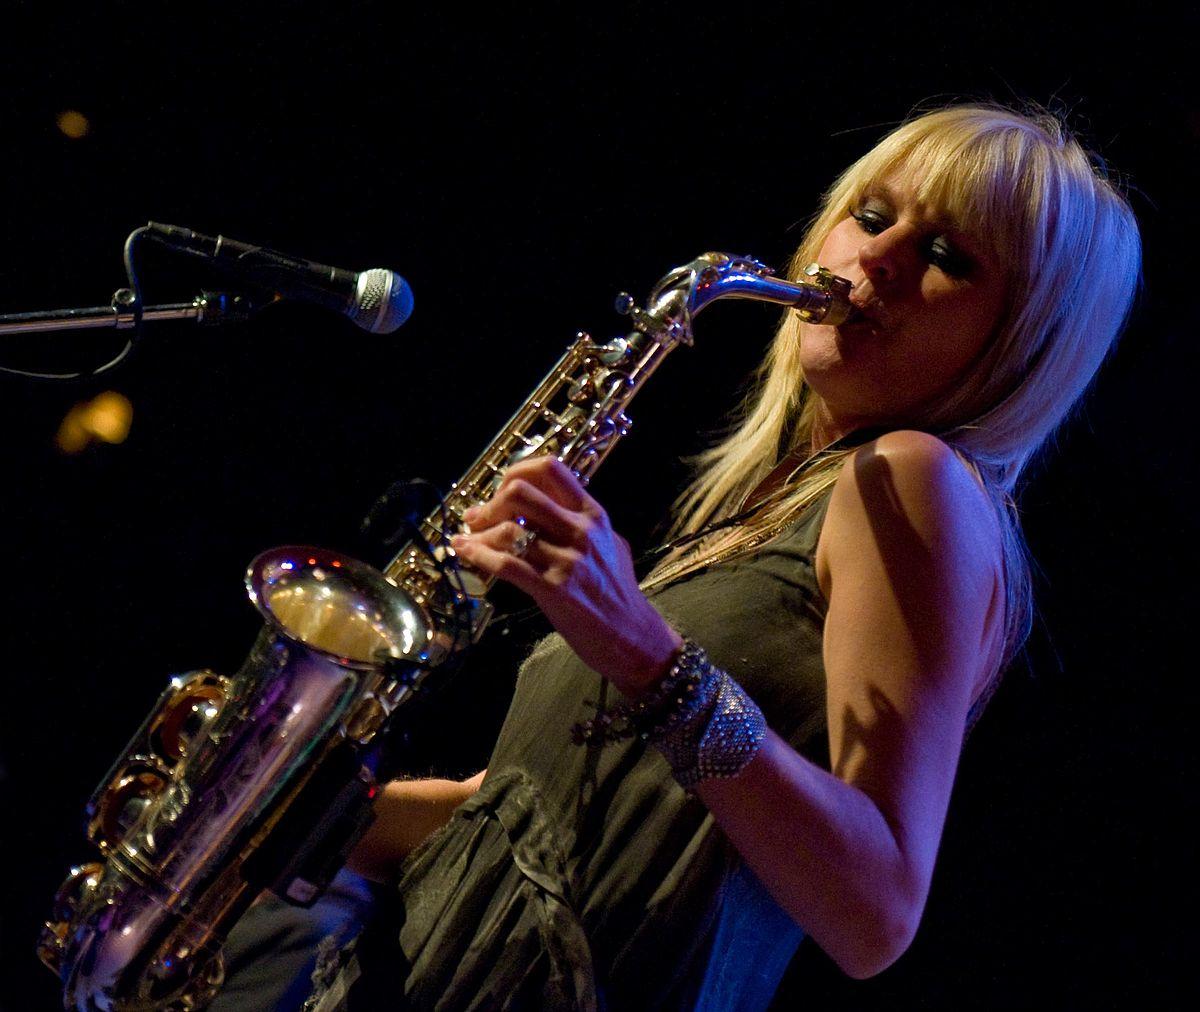 Blonde Sax Player